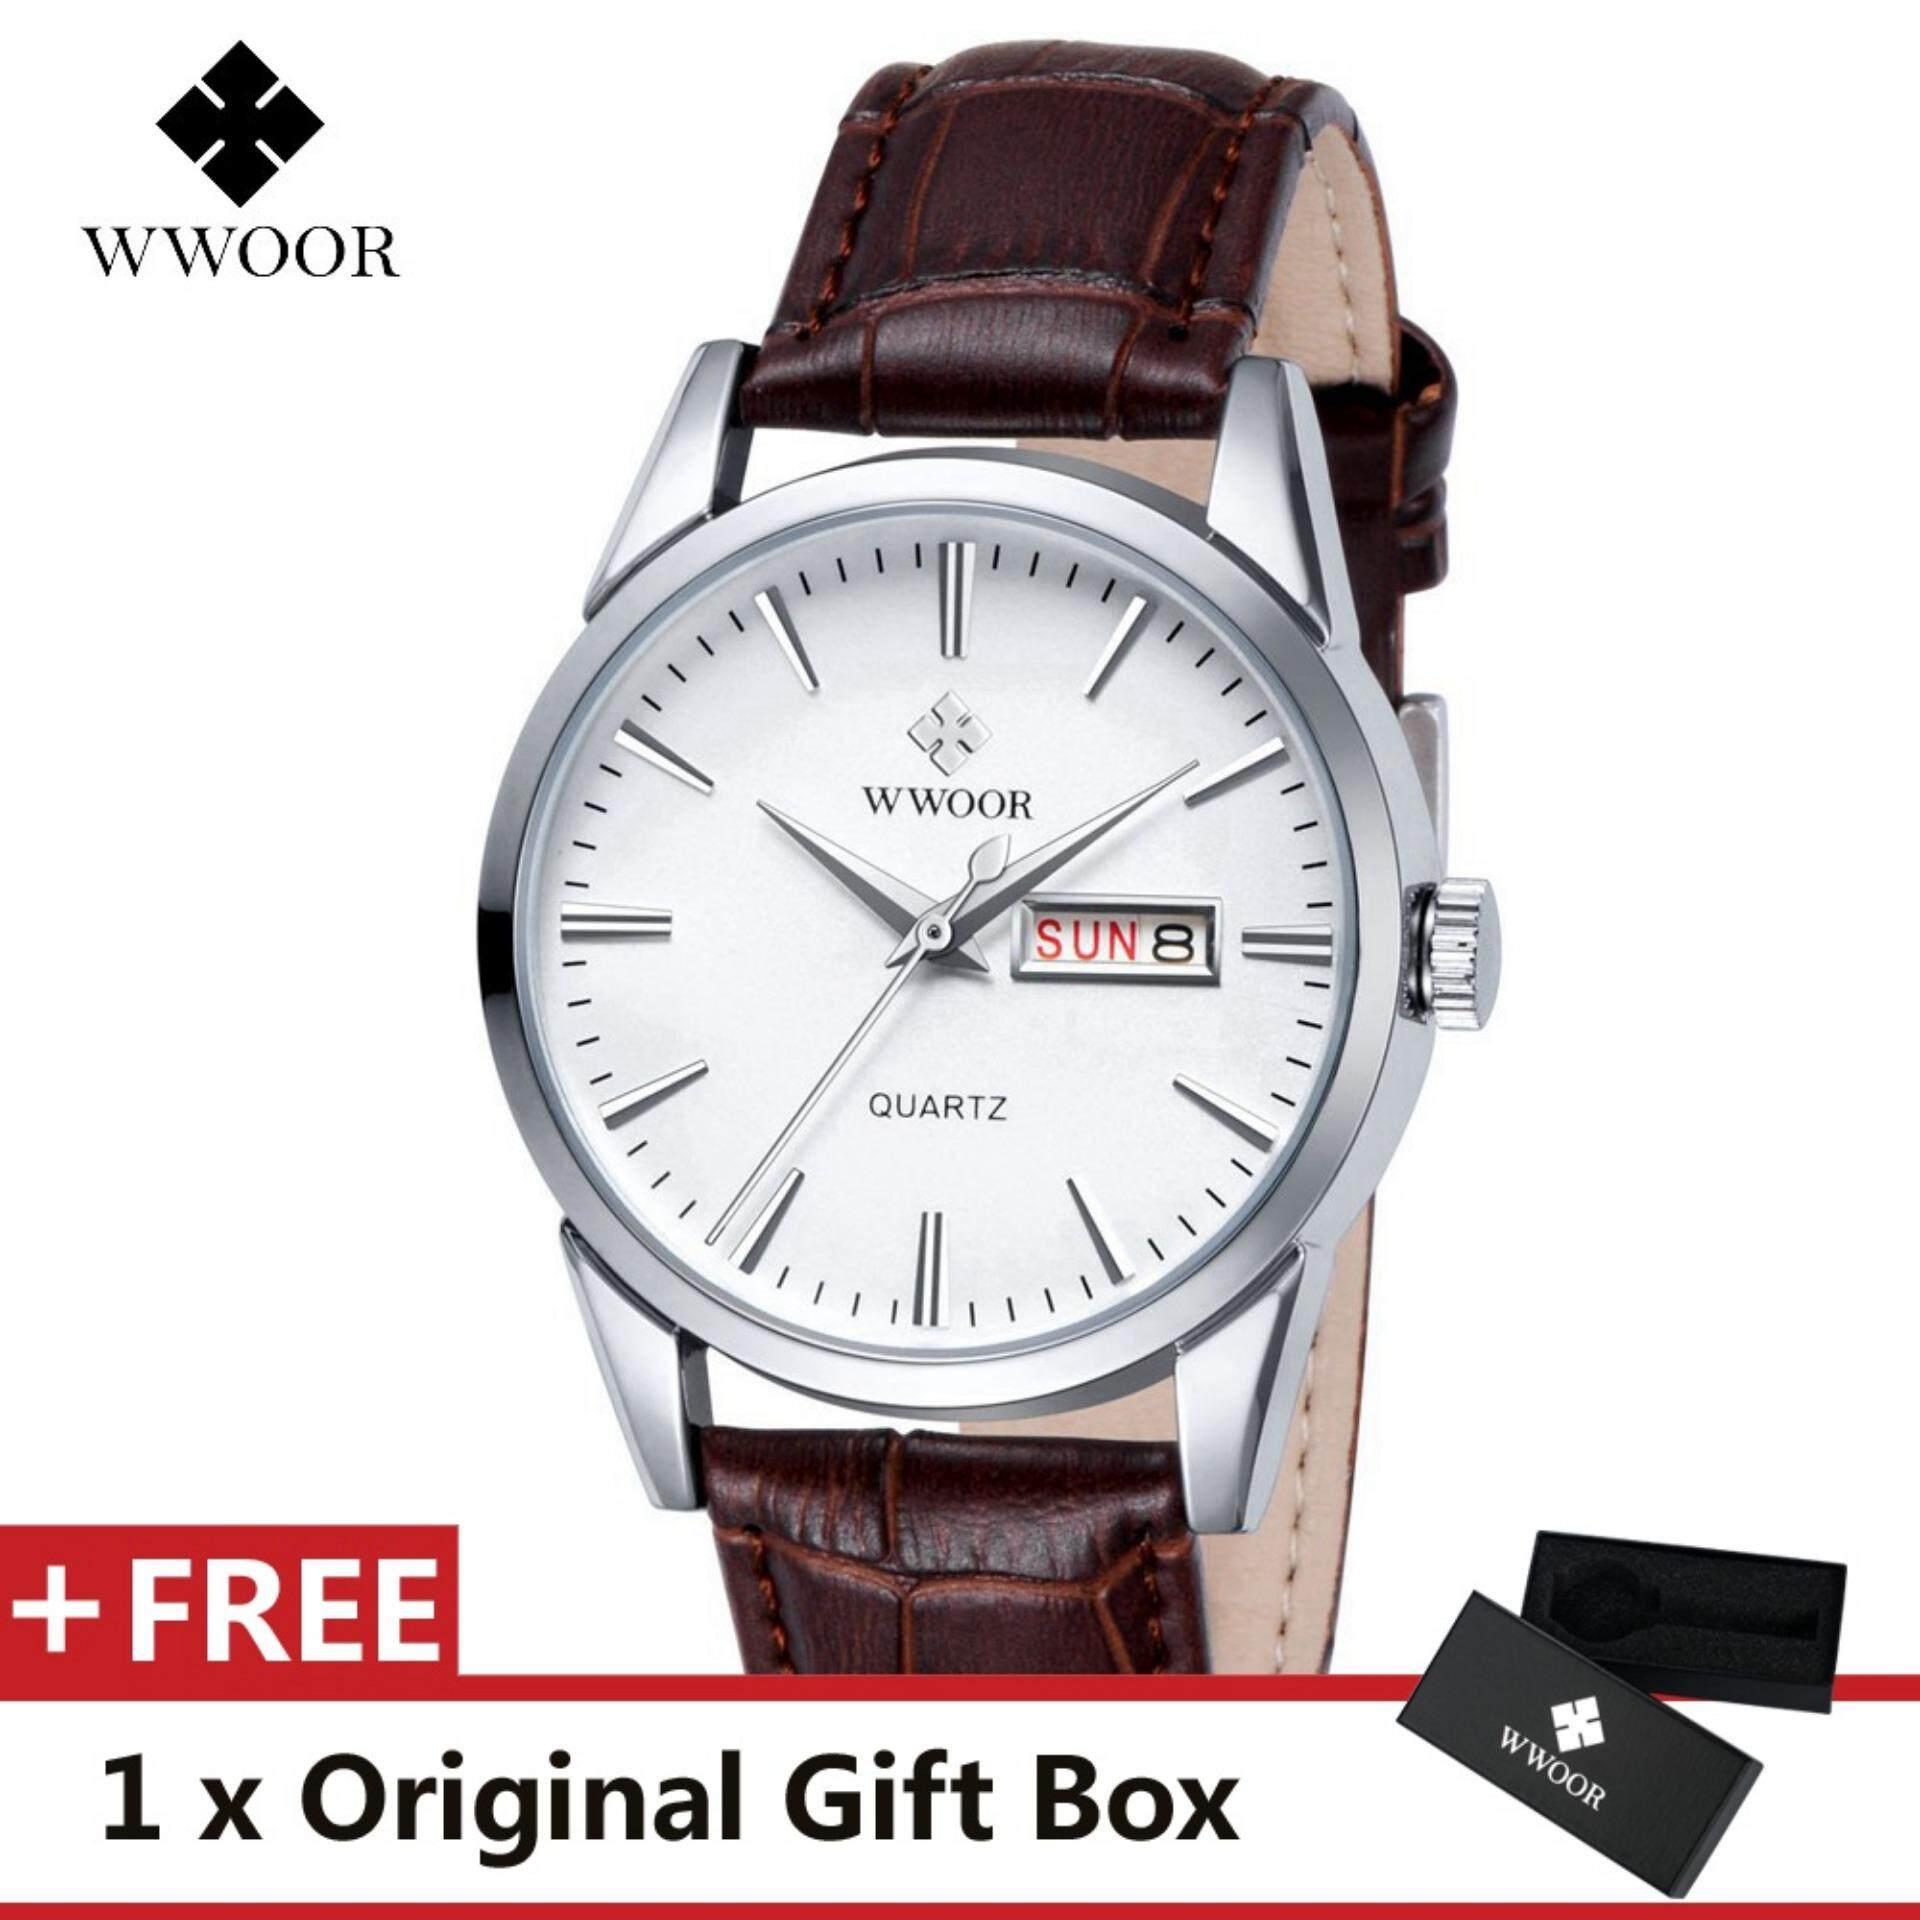 d23640489 WWOOR Top Luxury Brand Watch Famous Fashion Sports Cool Men Quartz Watches  Calendar Waterproof Leather Wristwatch